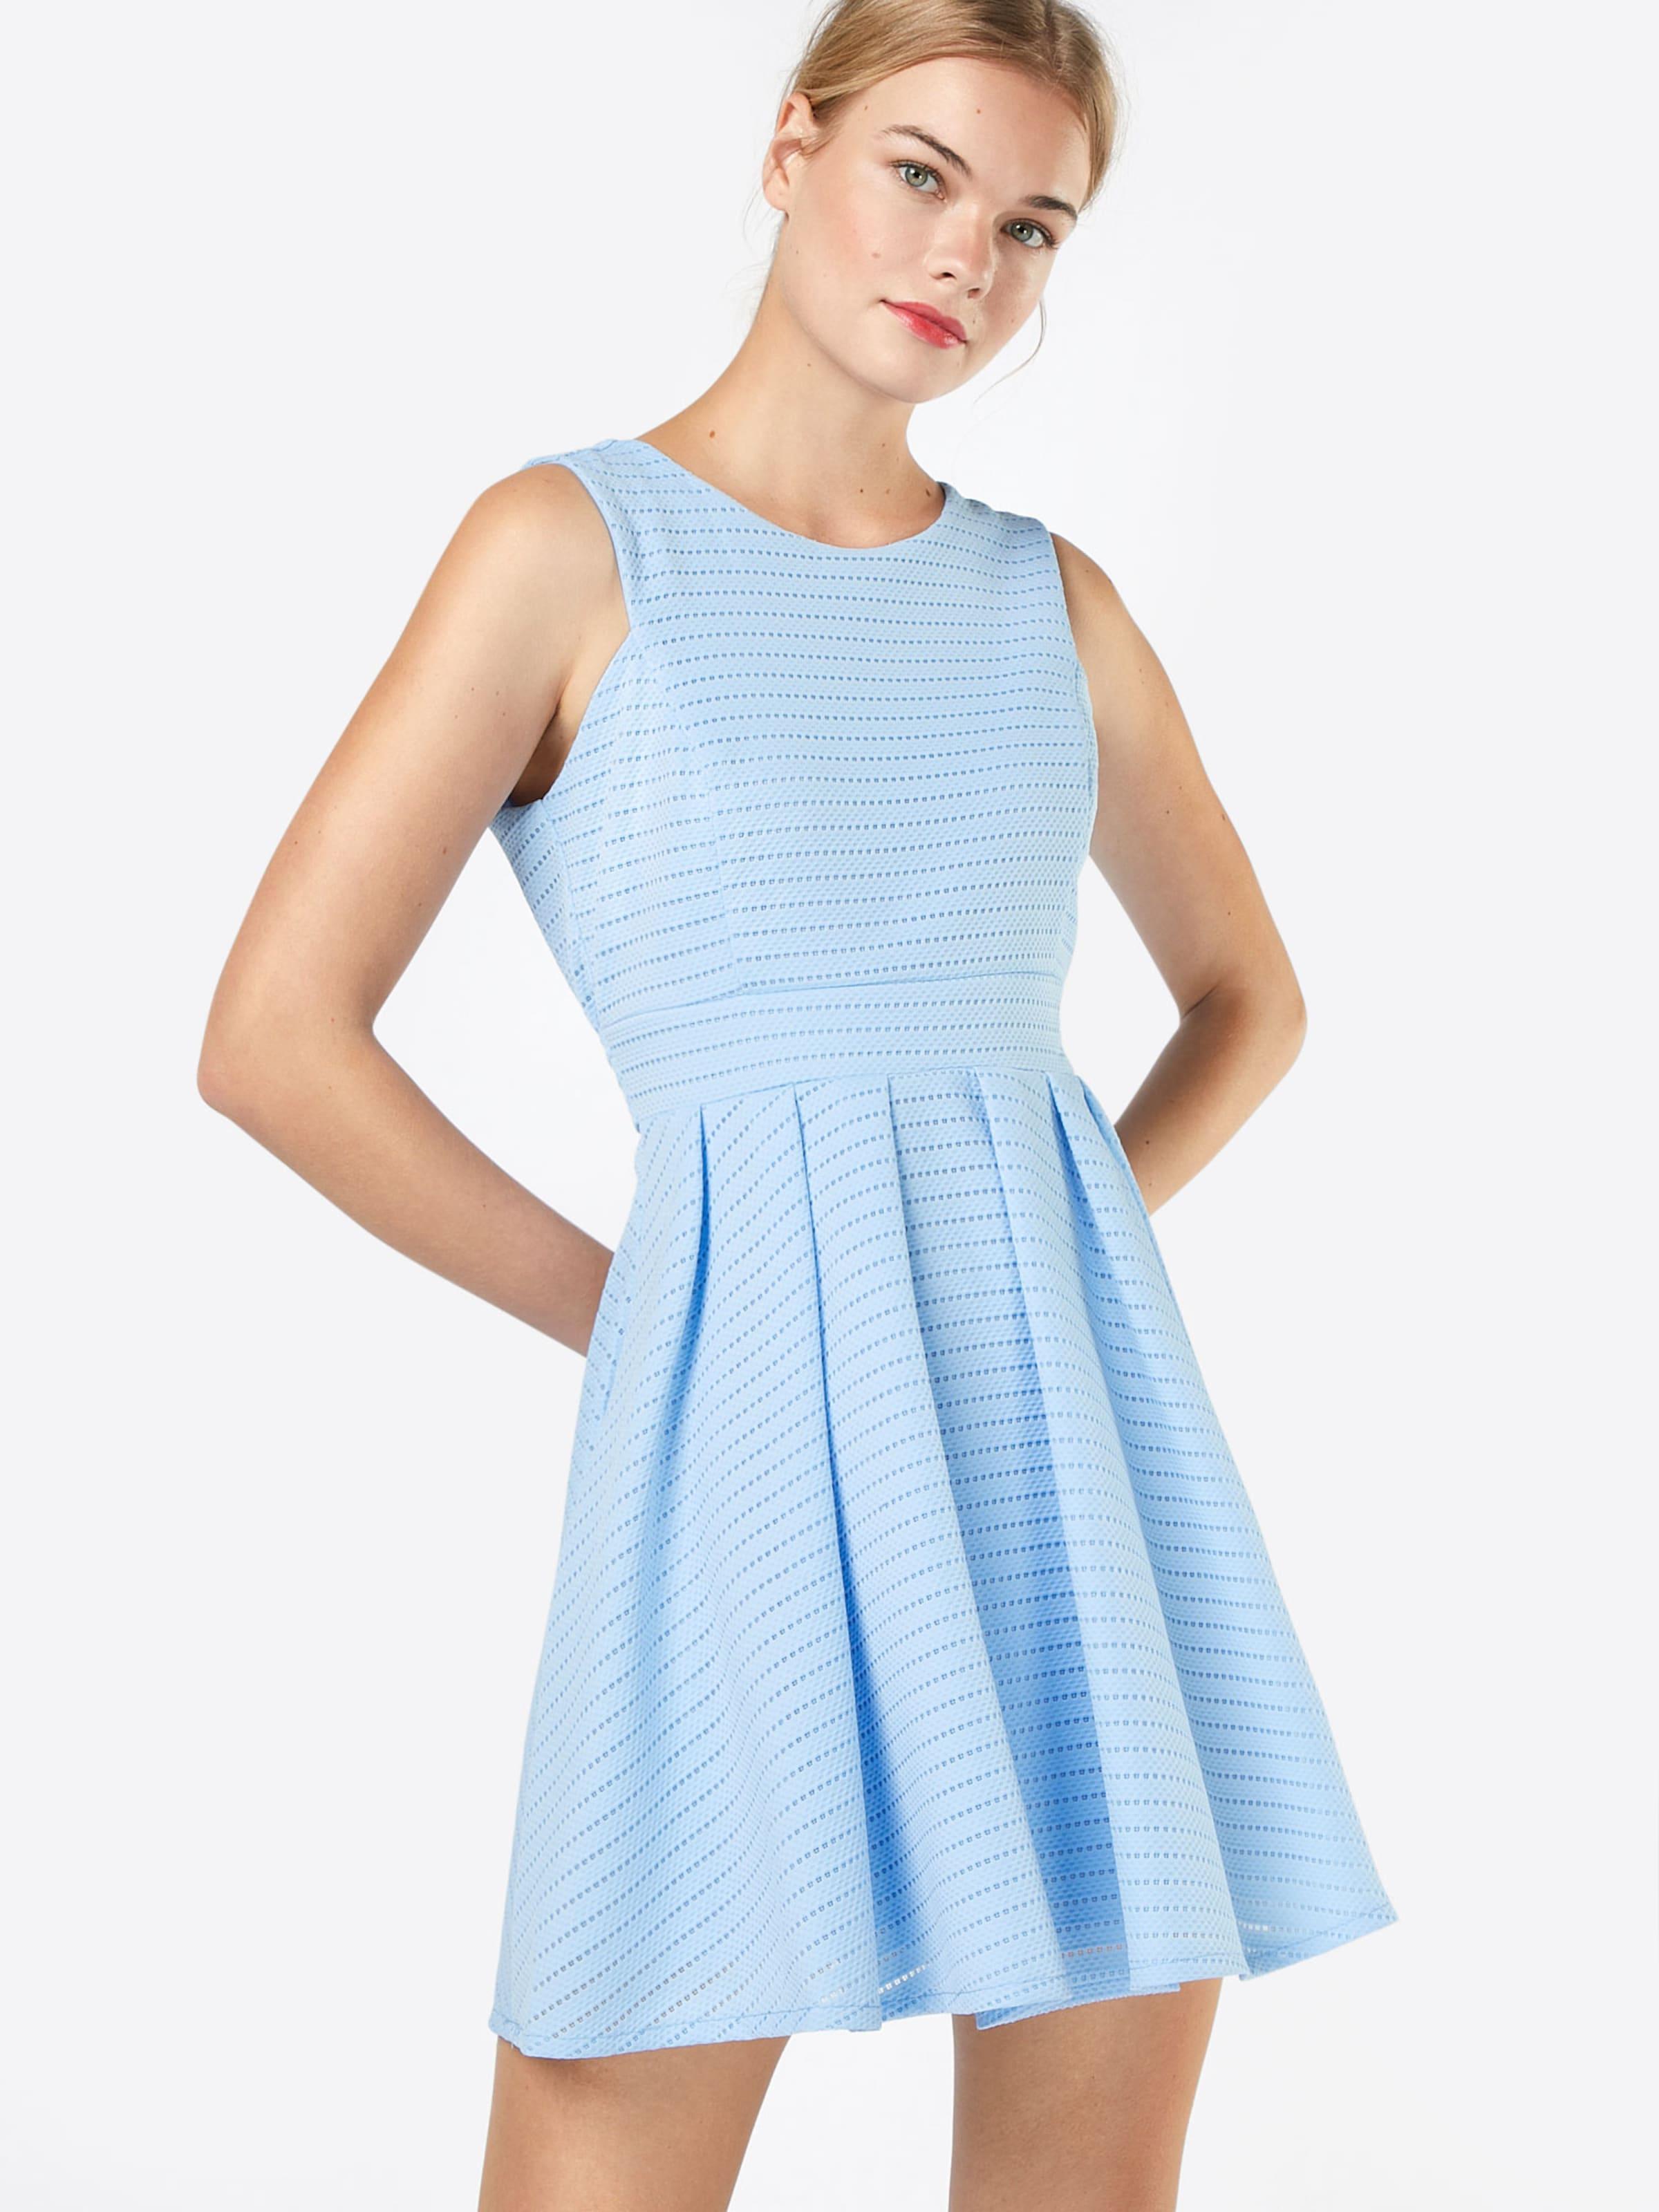 Mit Hellblau GAusgestelltes Kleid Lochmuster Wal In Pk80wnOX